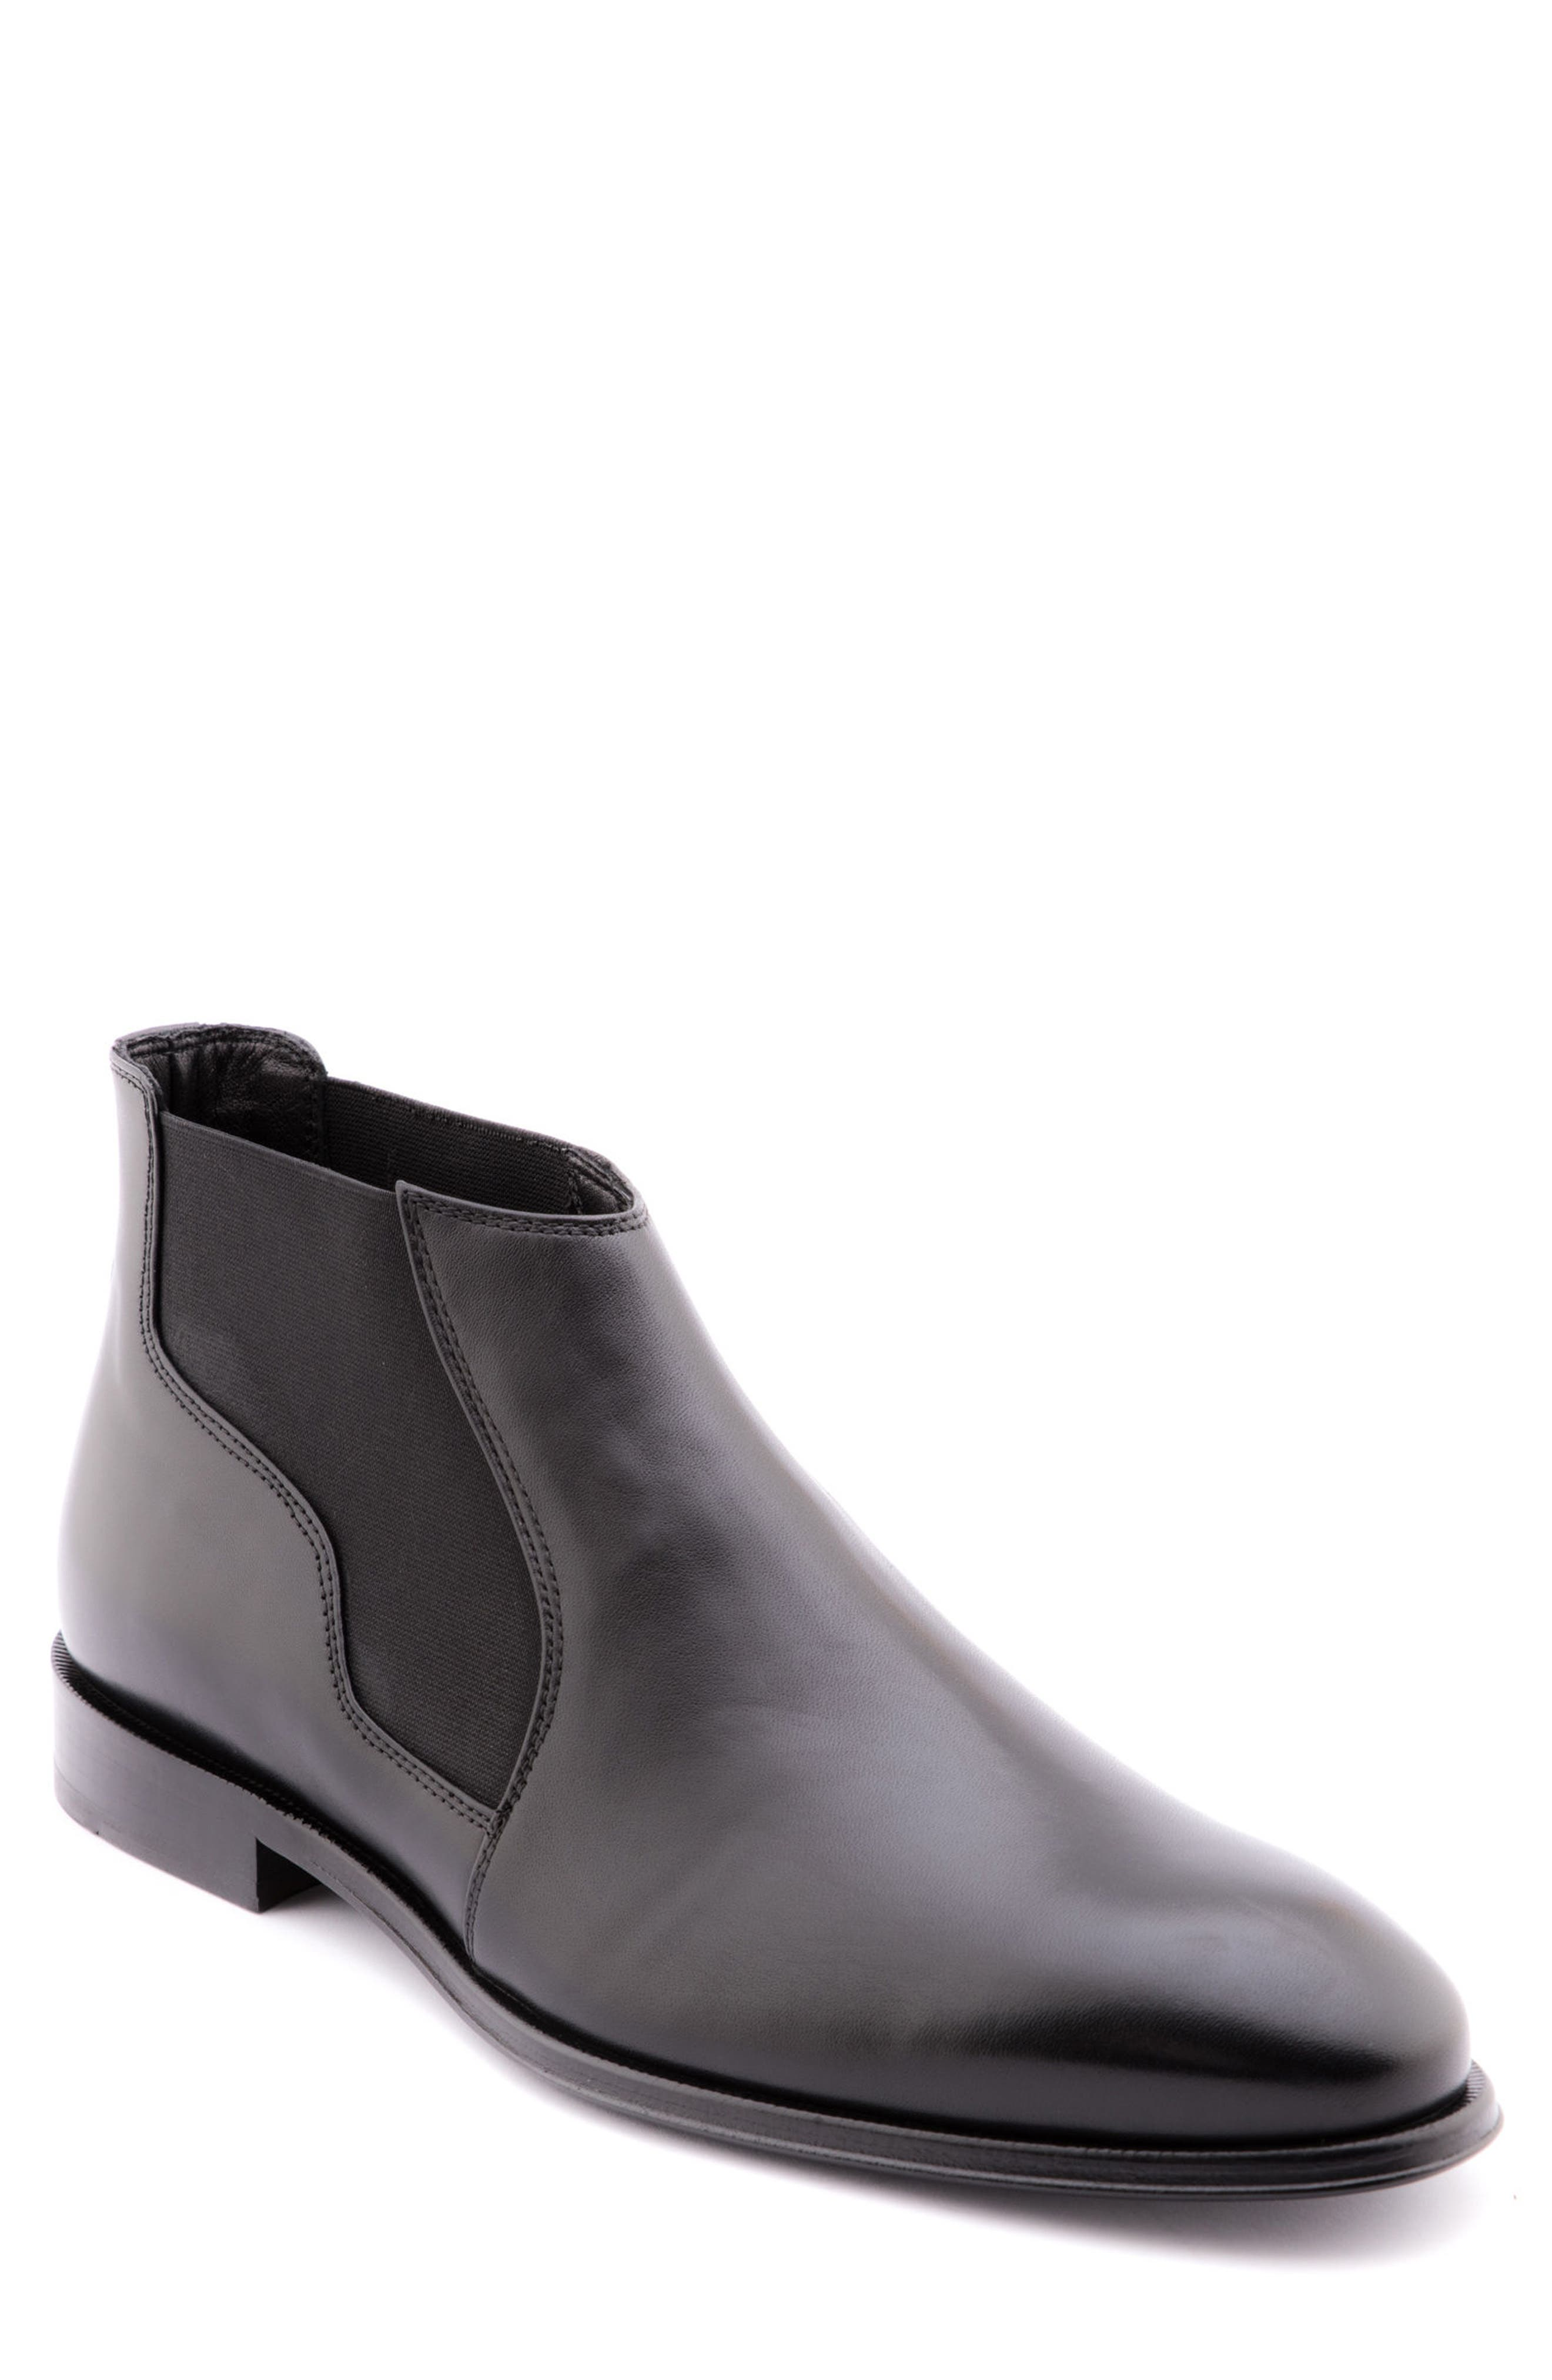 Steve Chelsea Boot,                         Main,                         color, BLACK